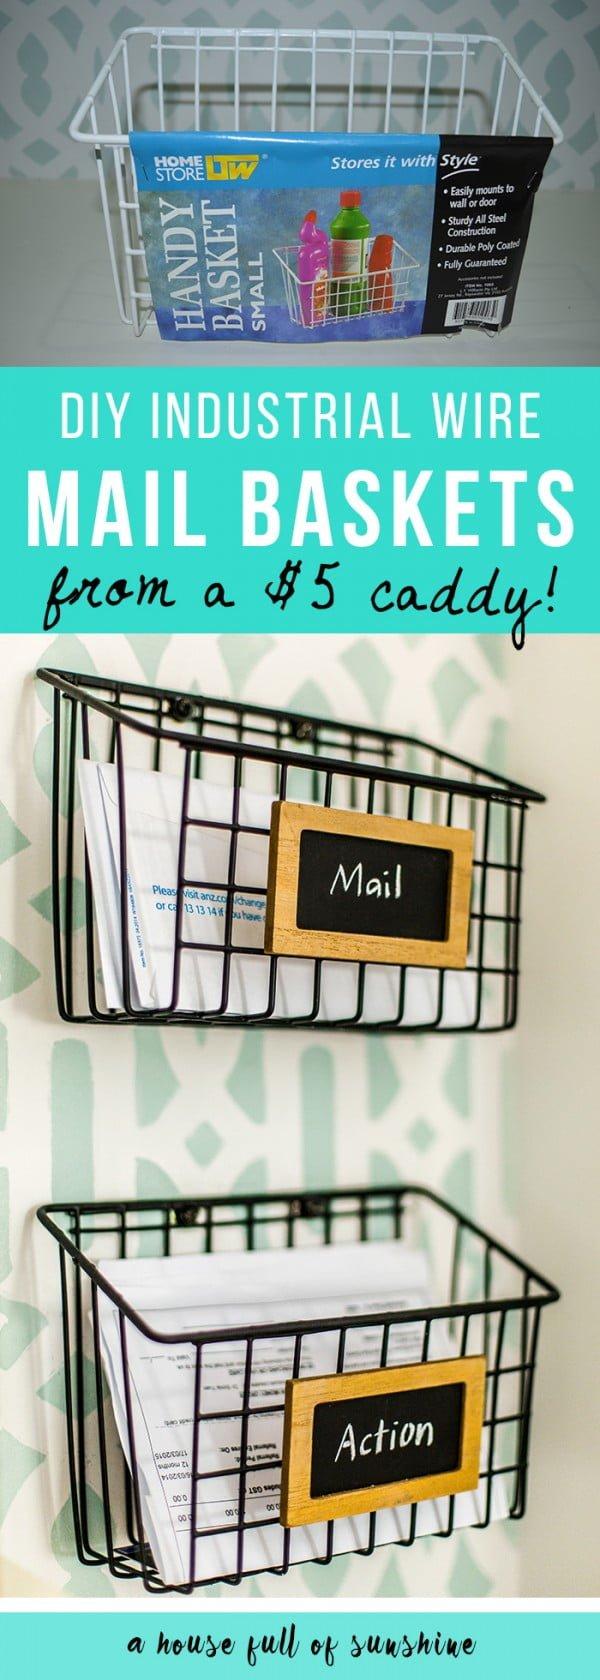 DIY industrial wire mail baskets